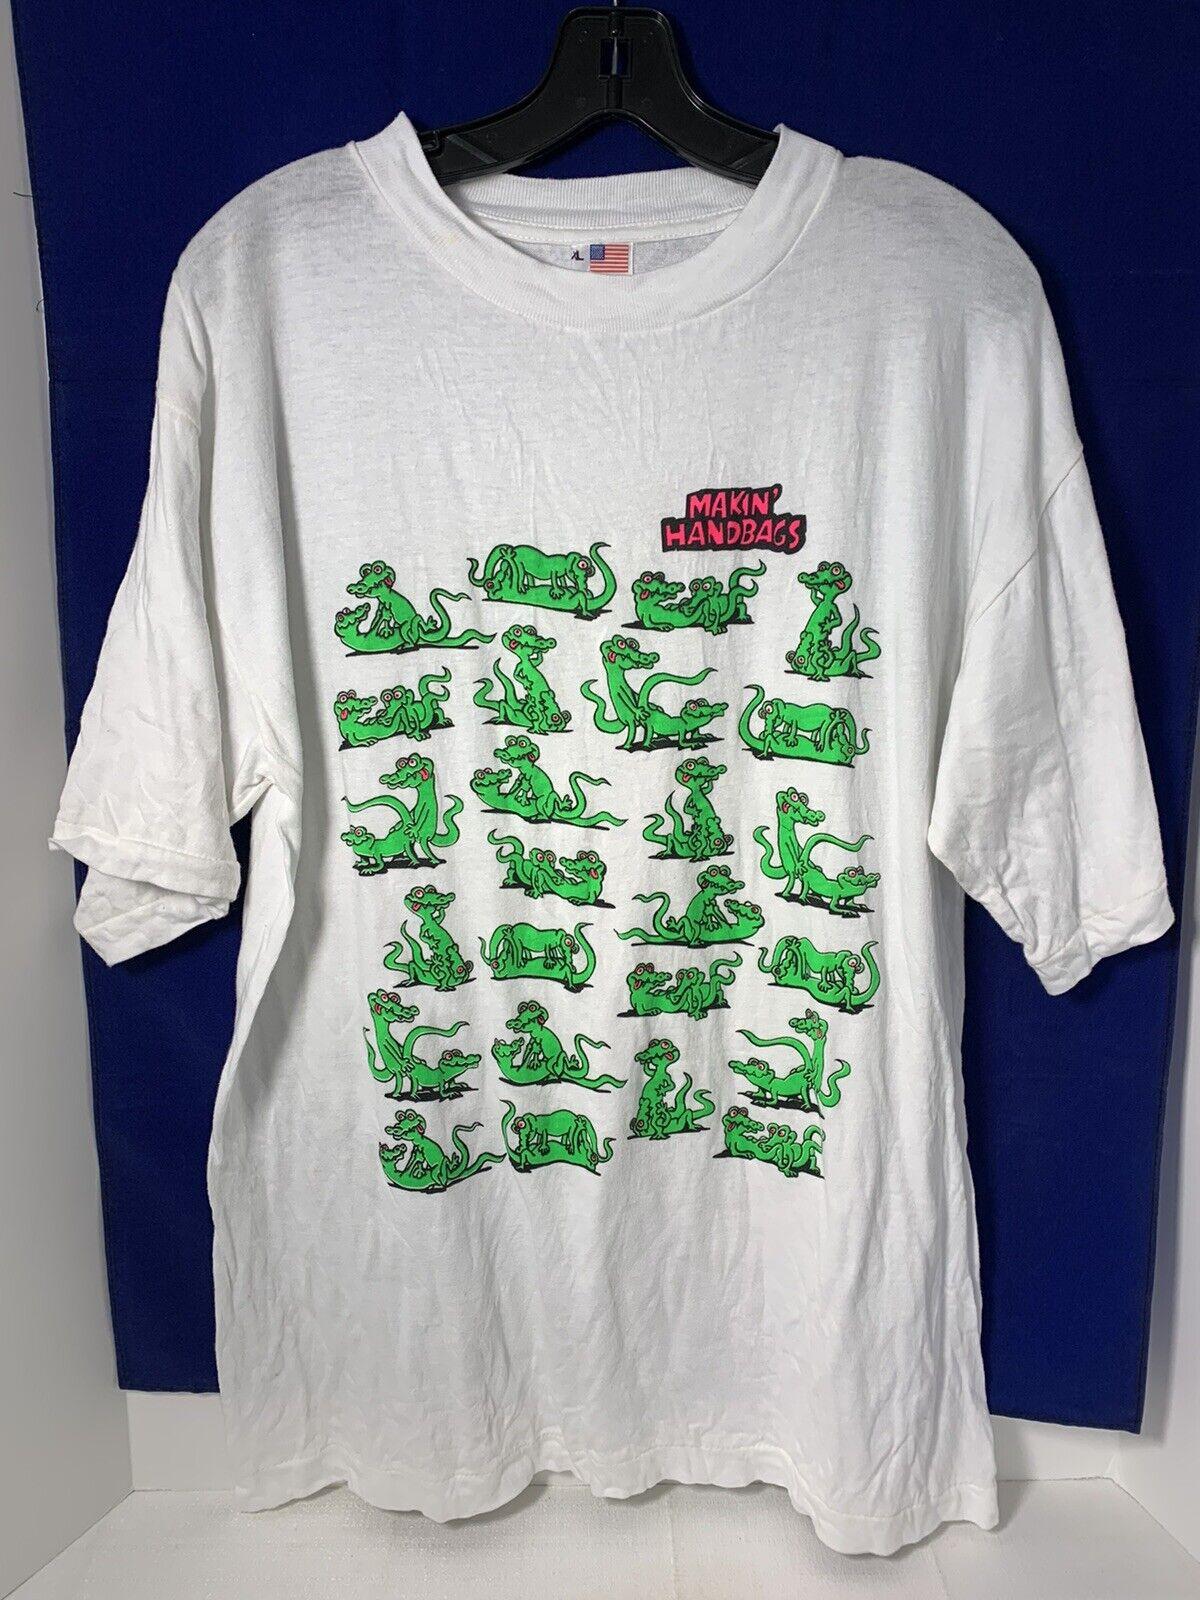 Vtg Novelty XL t-shirt Makin' Handbags Alligator naughty adult position cotton